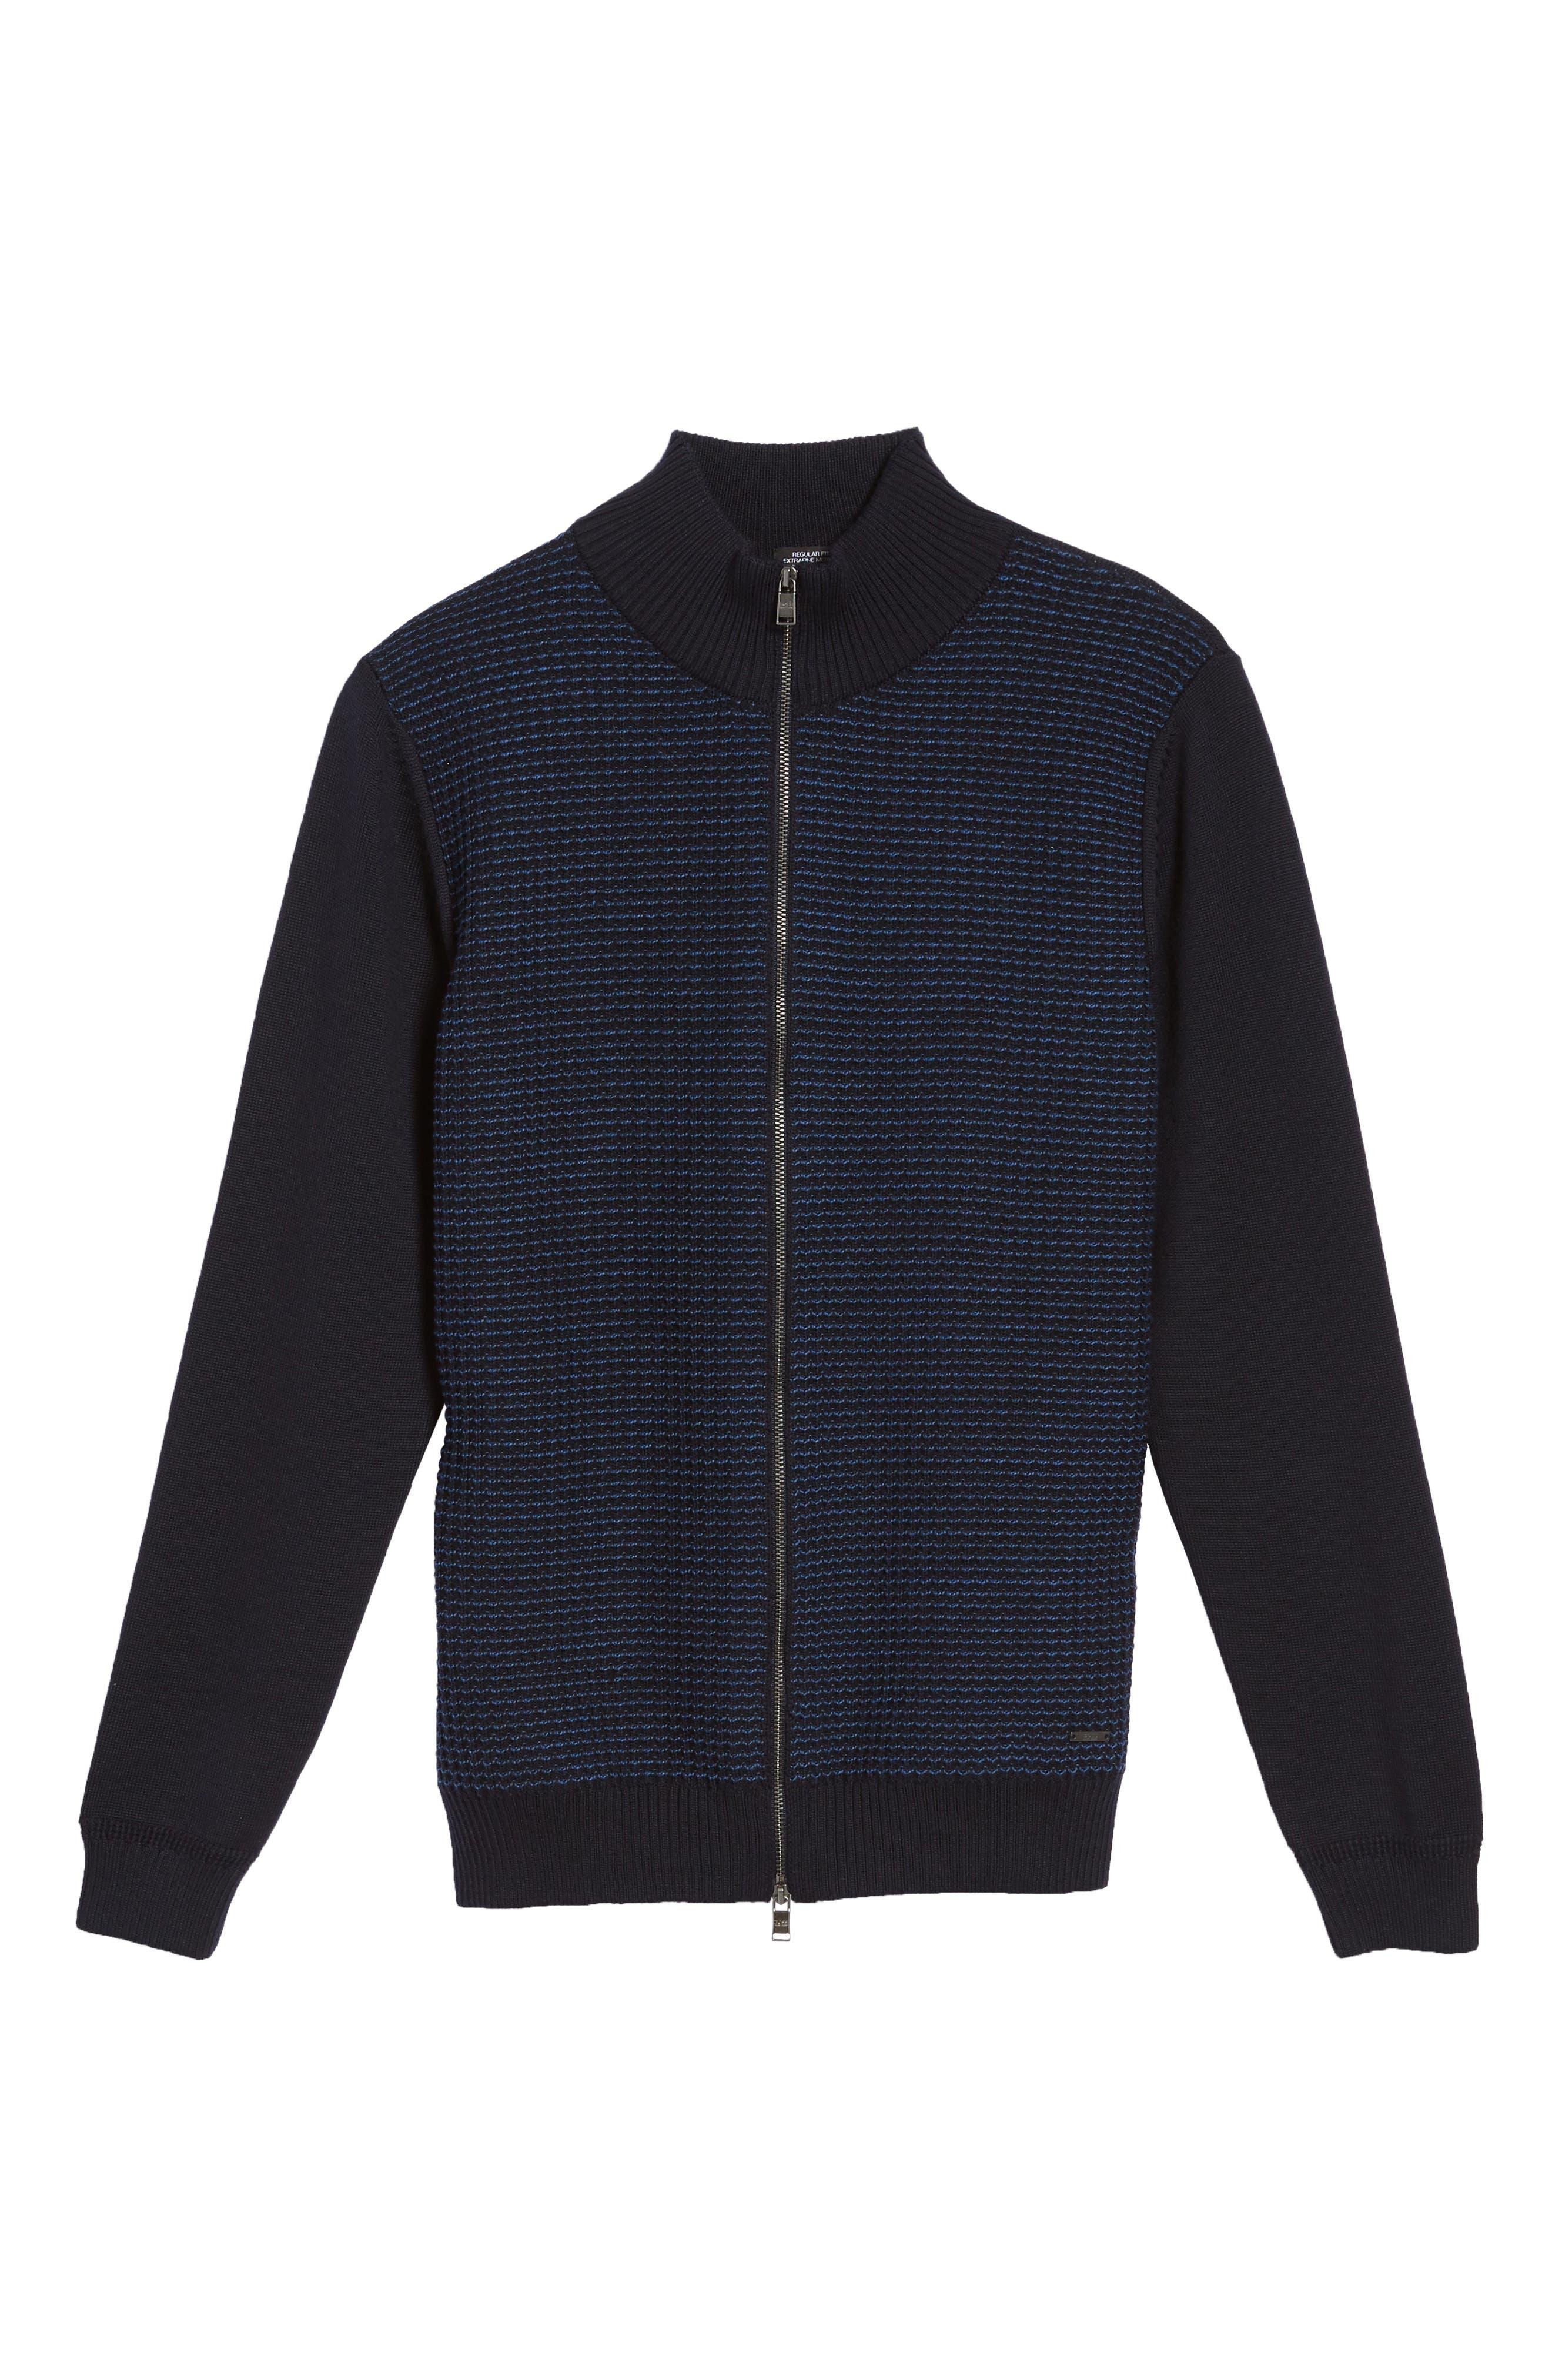 Bacco Full Zip Wool Sweater Jacket,                             Alternate thumbnail 5, color,                             Navy